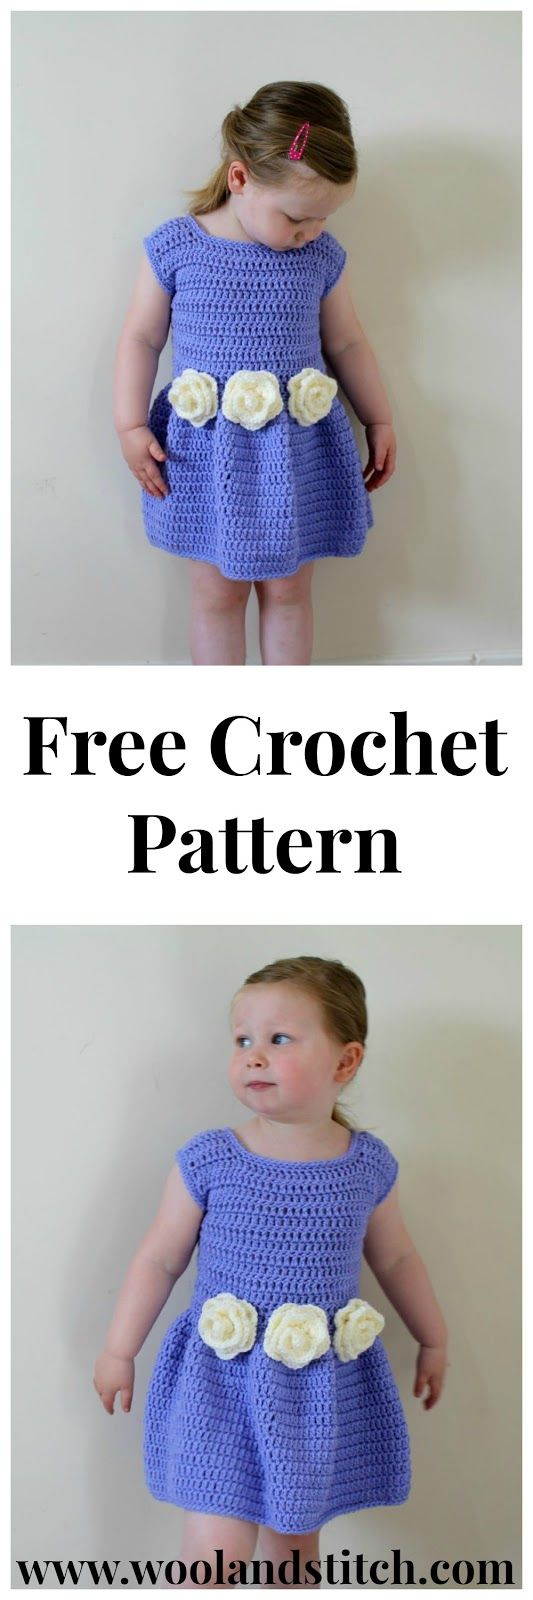 Crochet Pattern For Flower Girl Dress : 399 best images about Crochet Toddlers & Kids on Pinterest ...